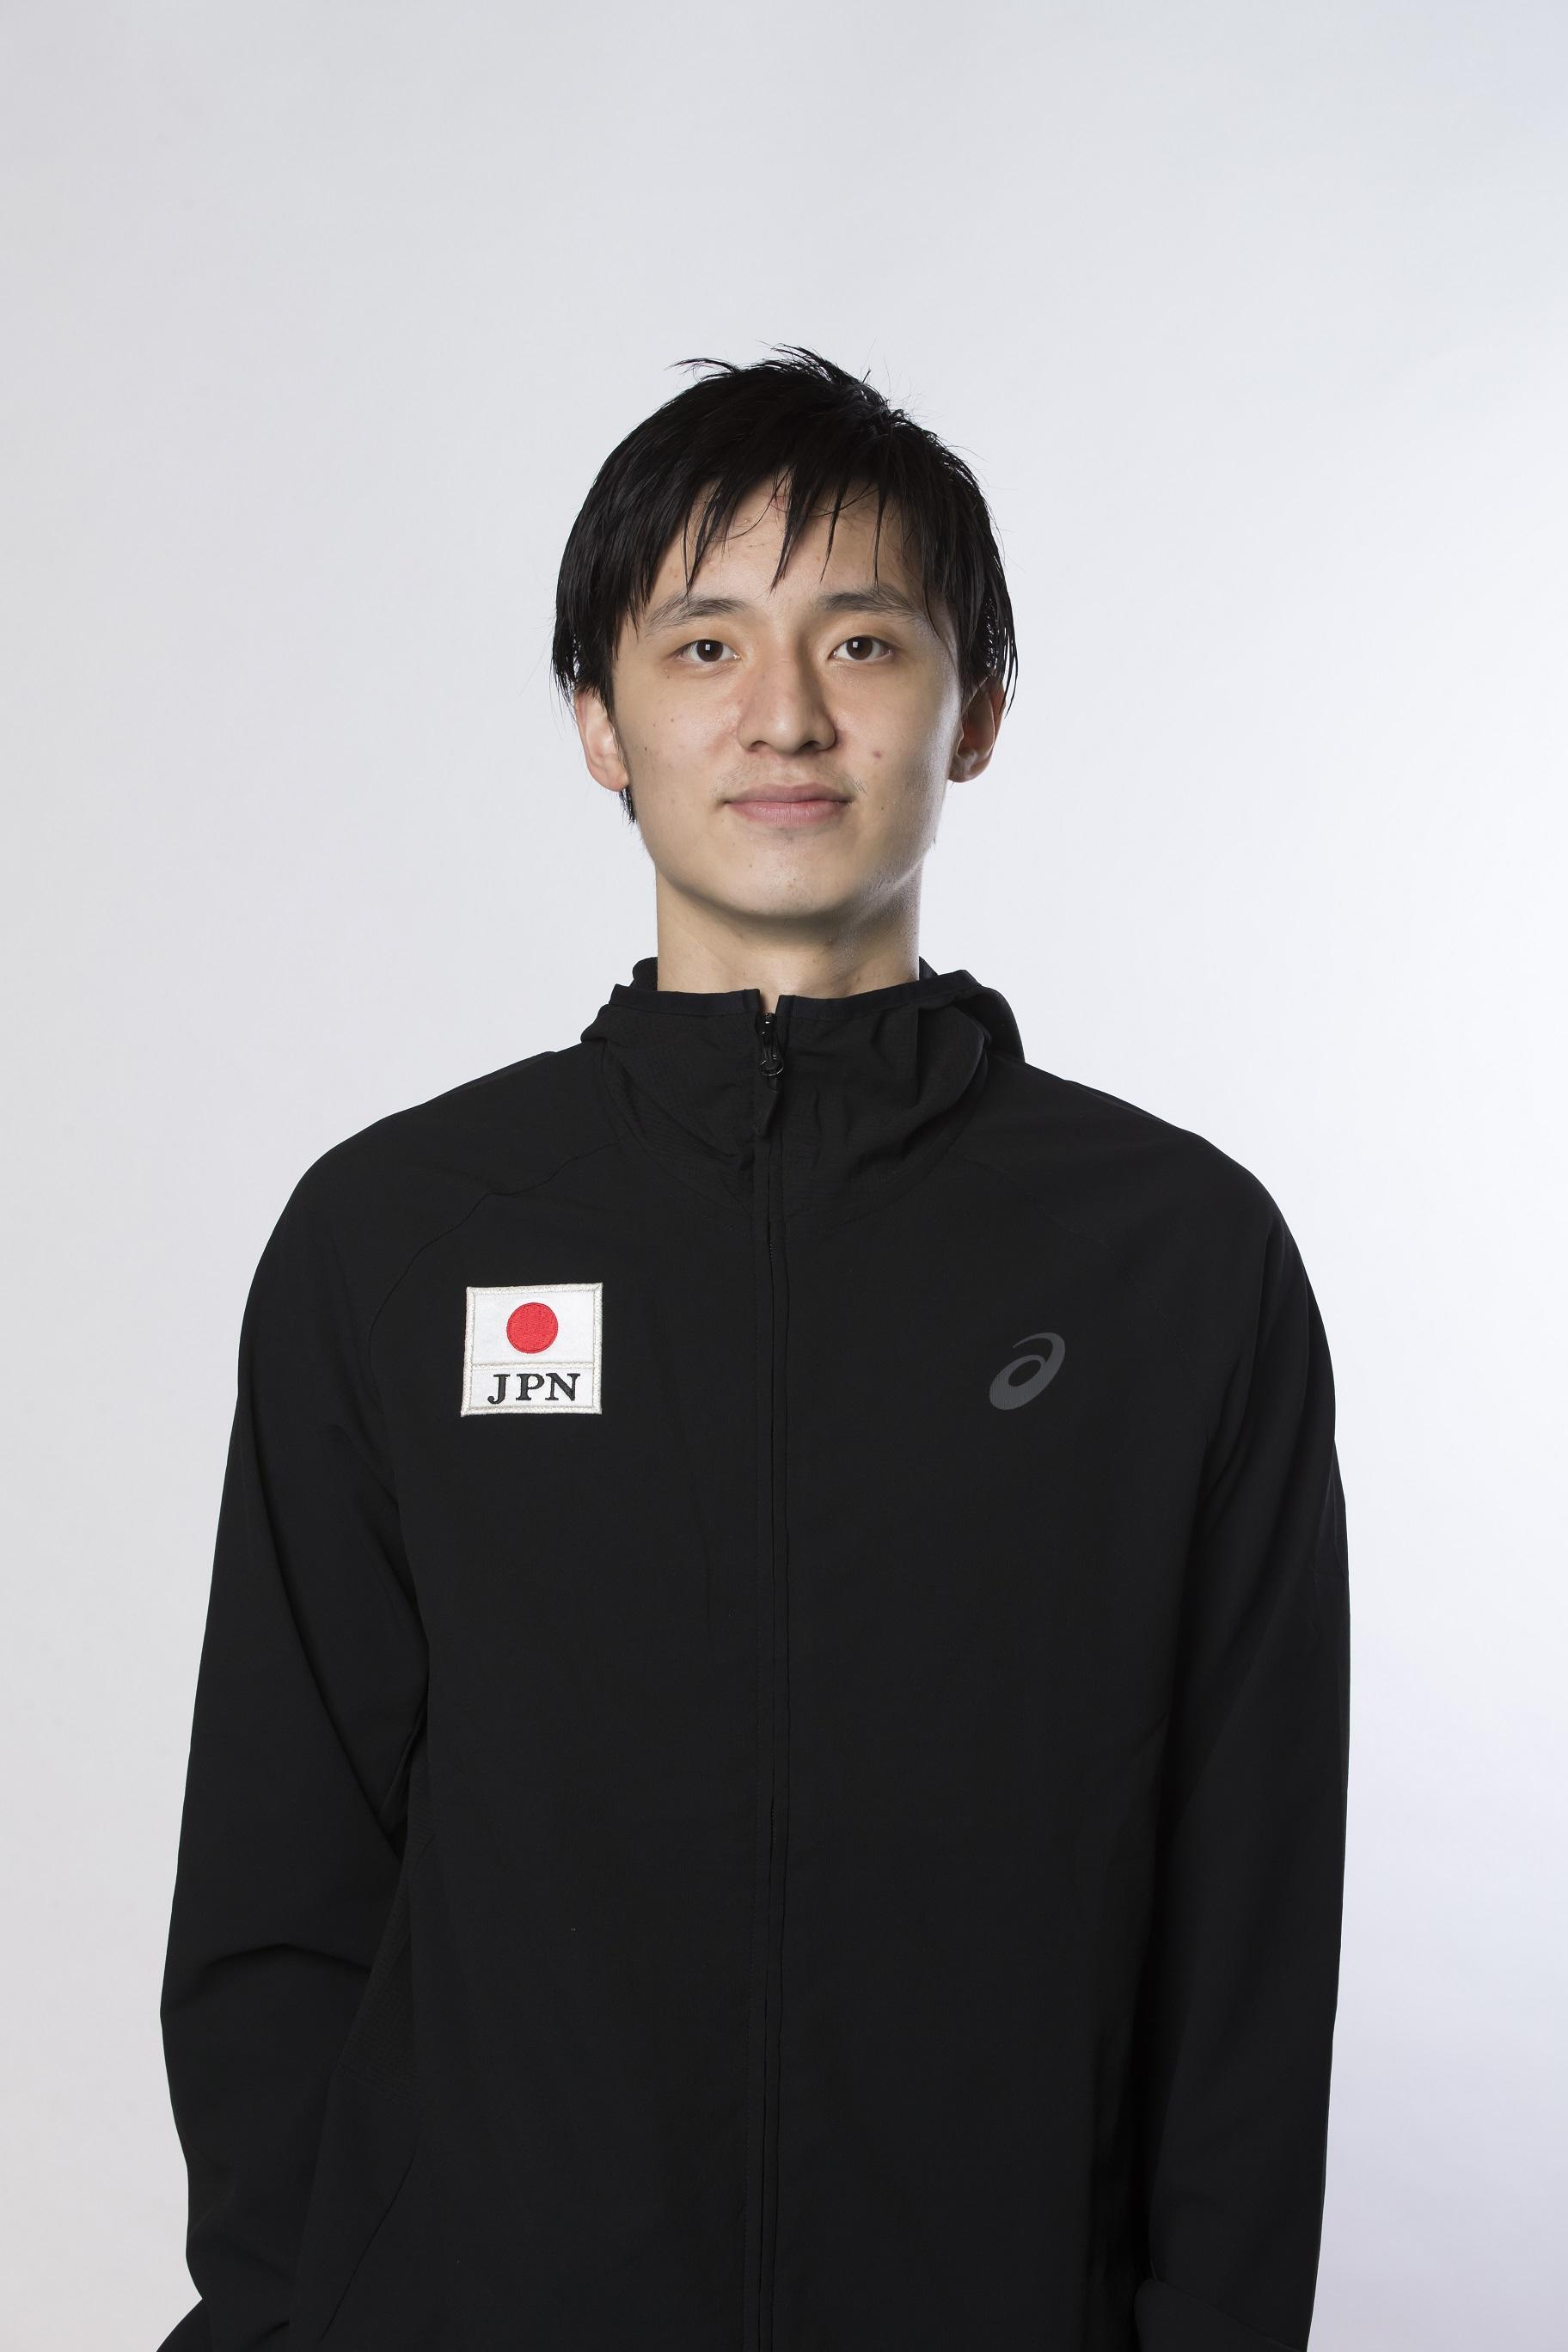 Masaki Kaneko